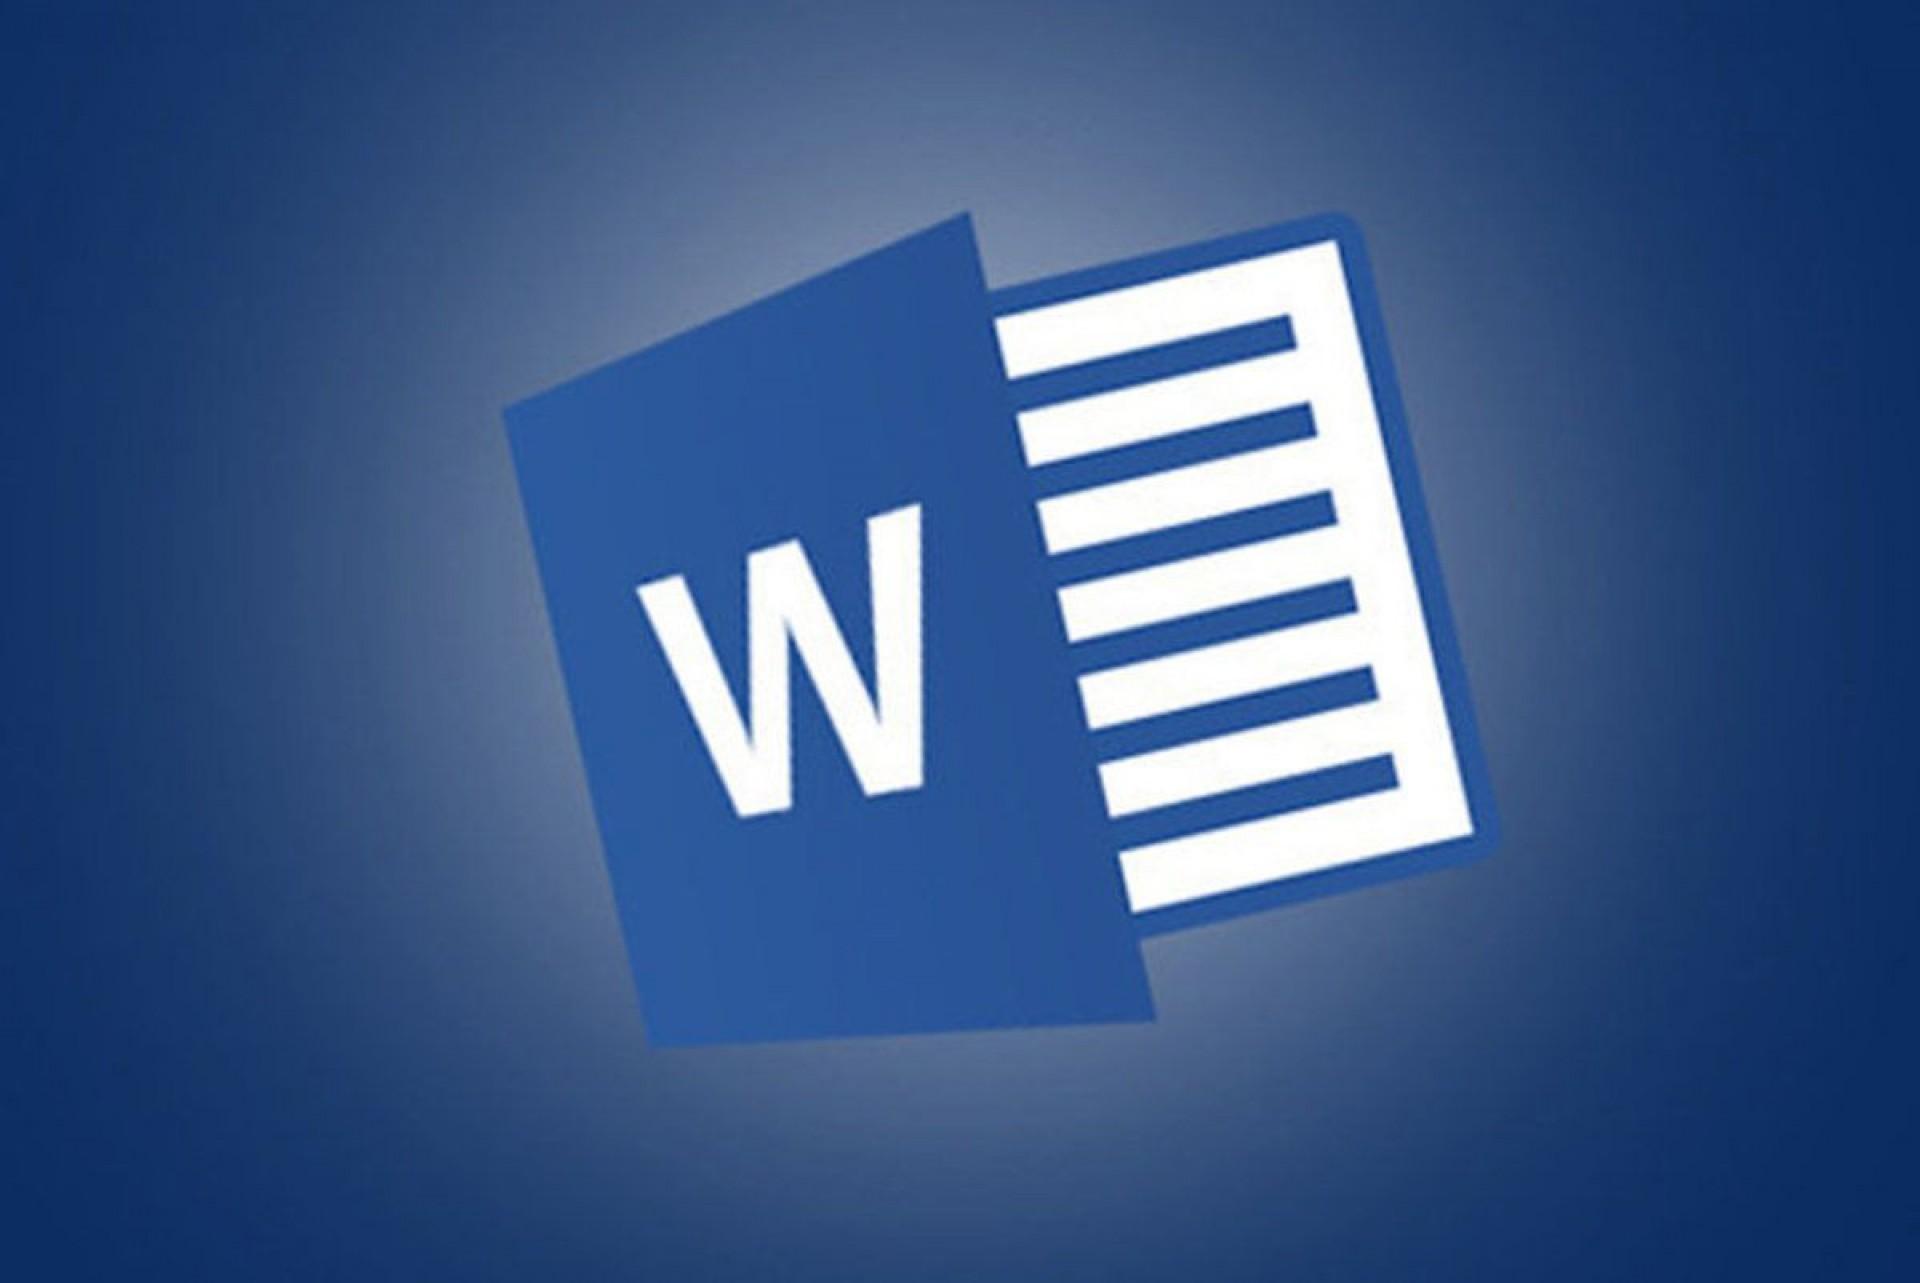 006 Impressive Microsoft Office Template For Word Image  Resume Agenda1920